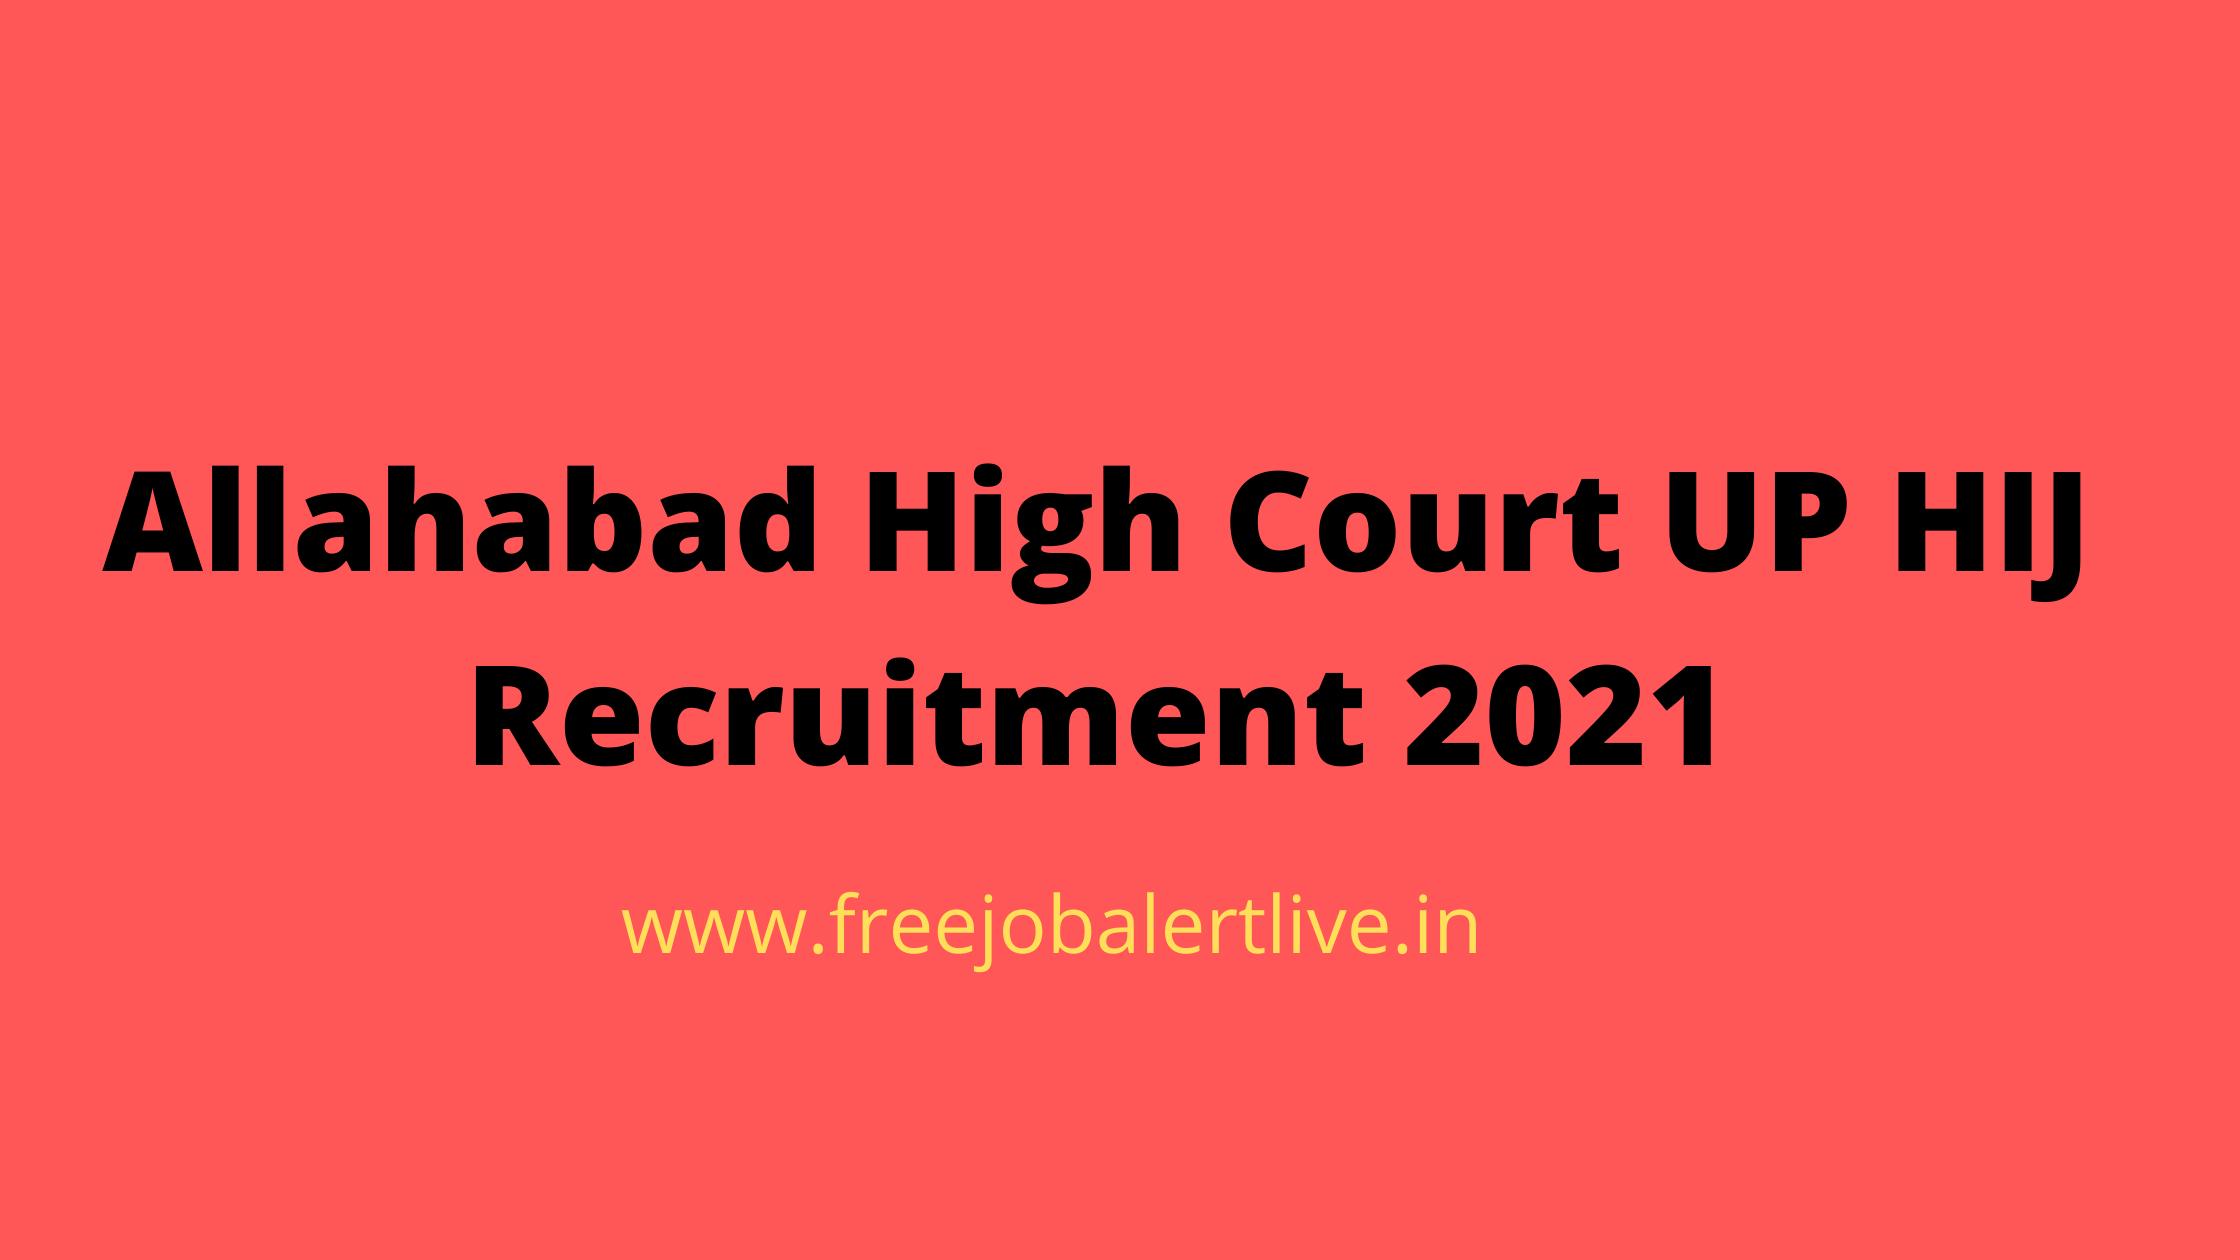 Allahabad High Court UP HIJ Recruitment 2021